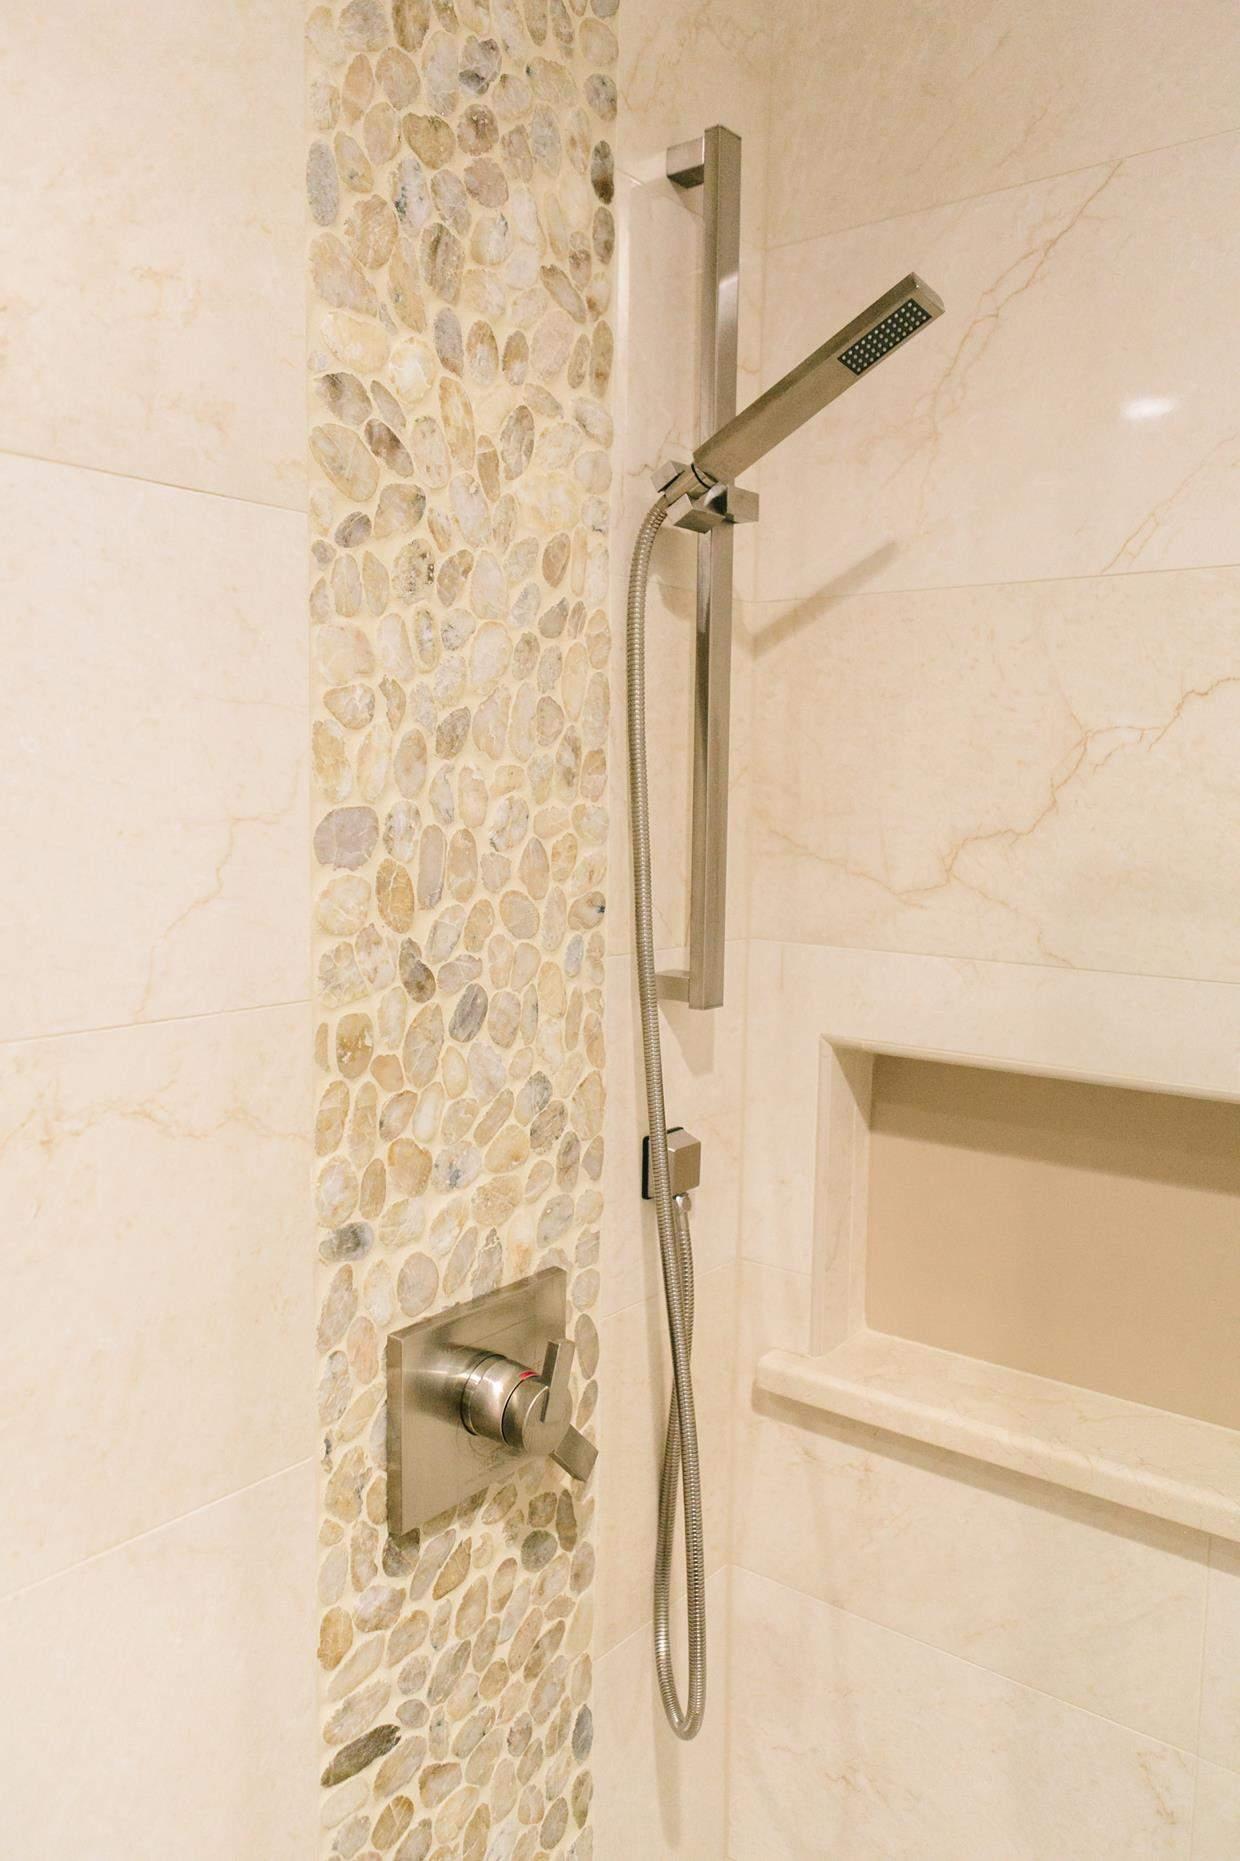 Design Secrets for a Small Master Bathroom - KBF Design Gallery